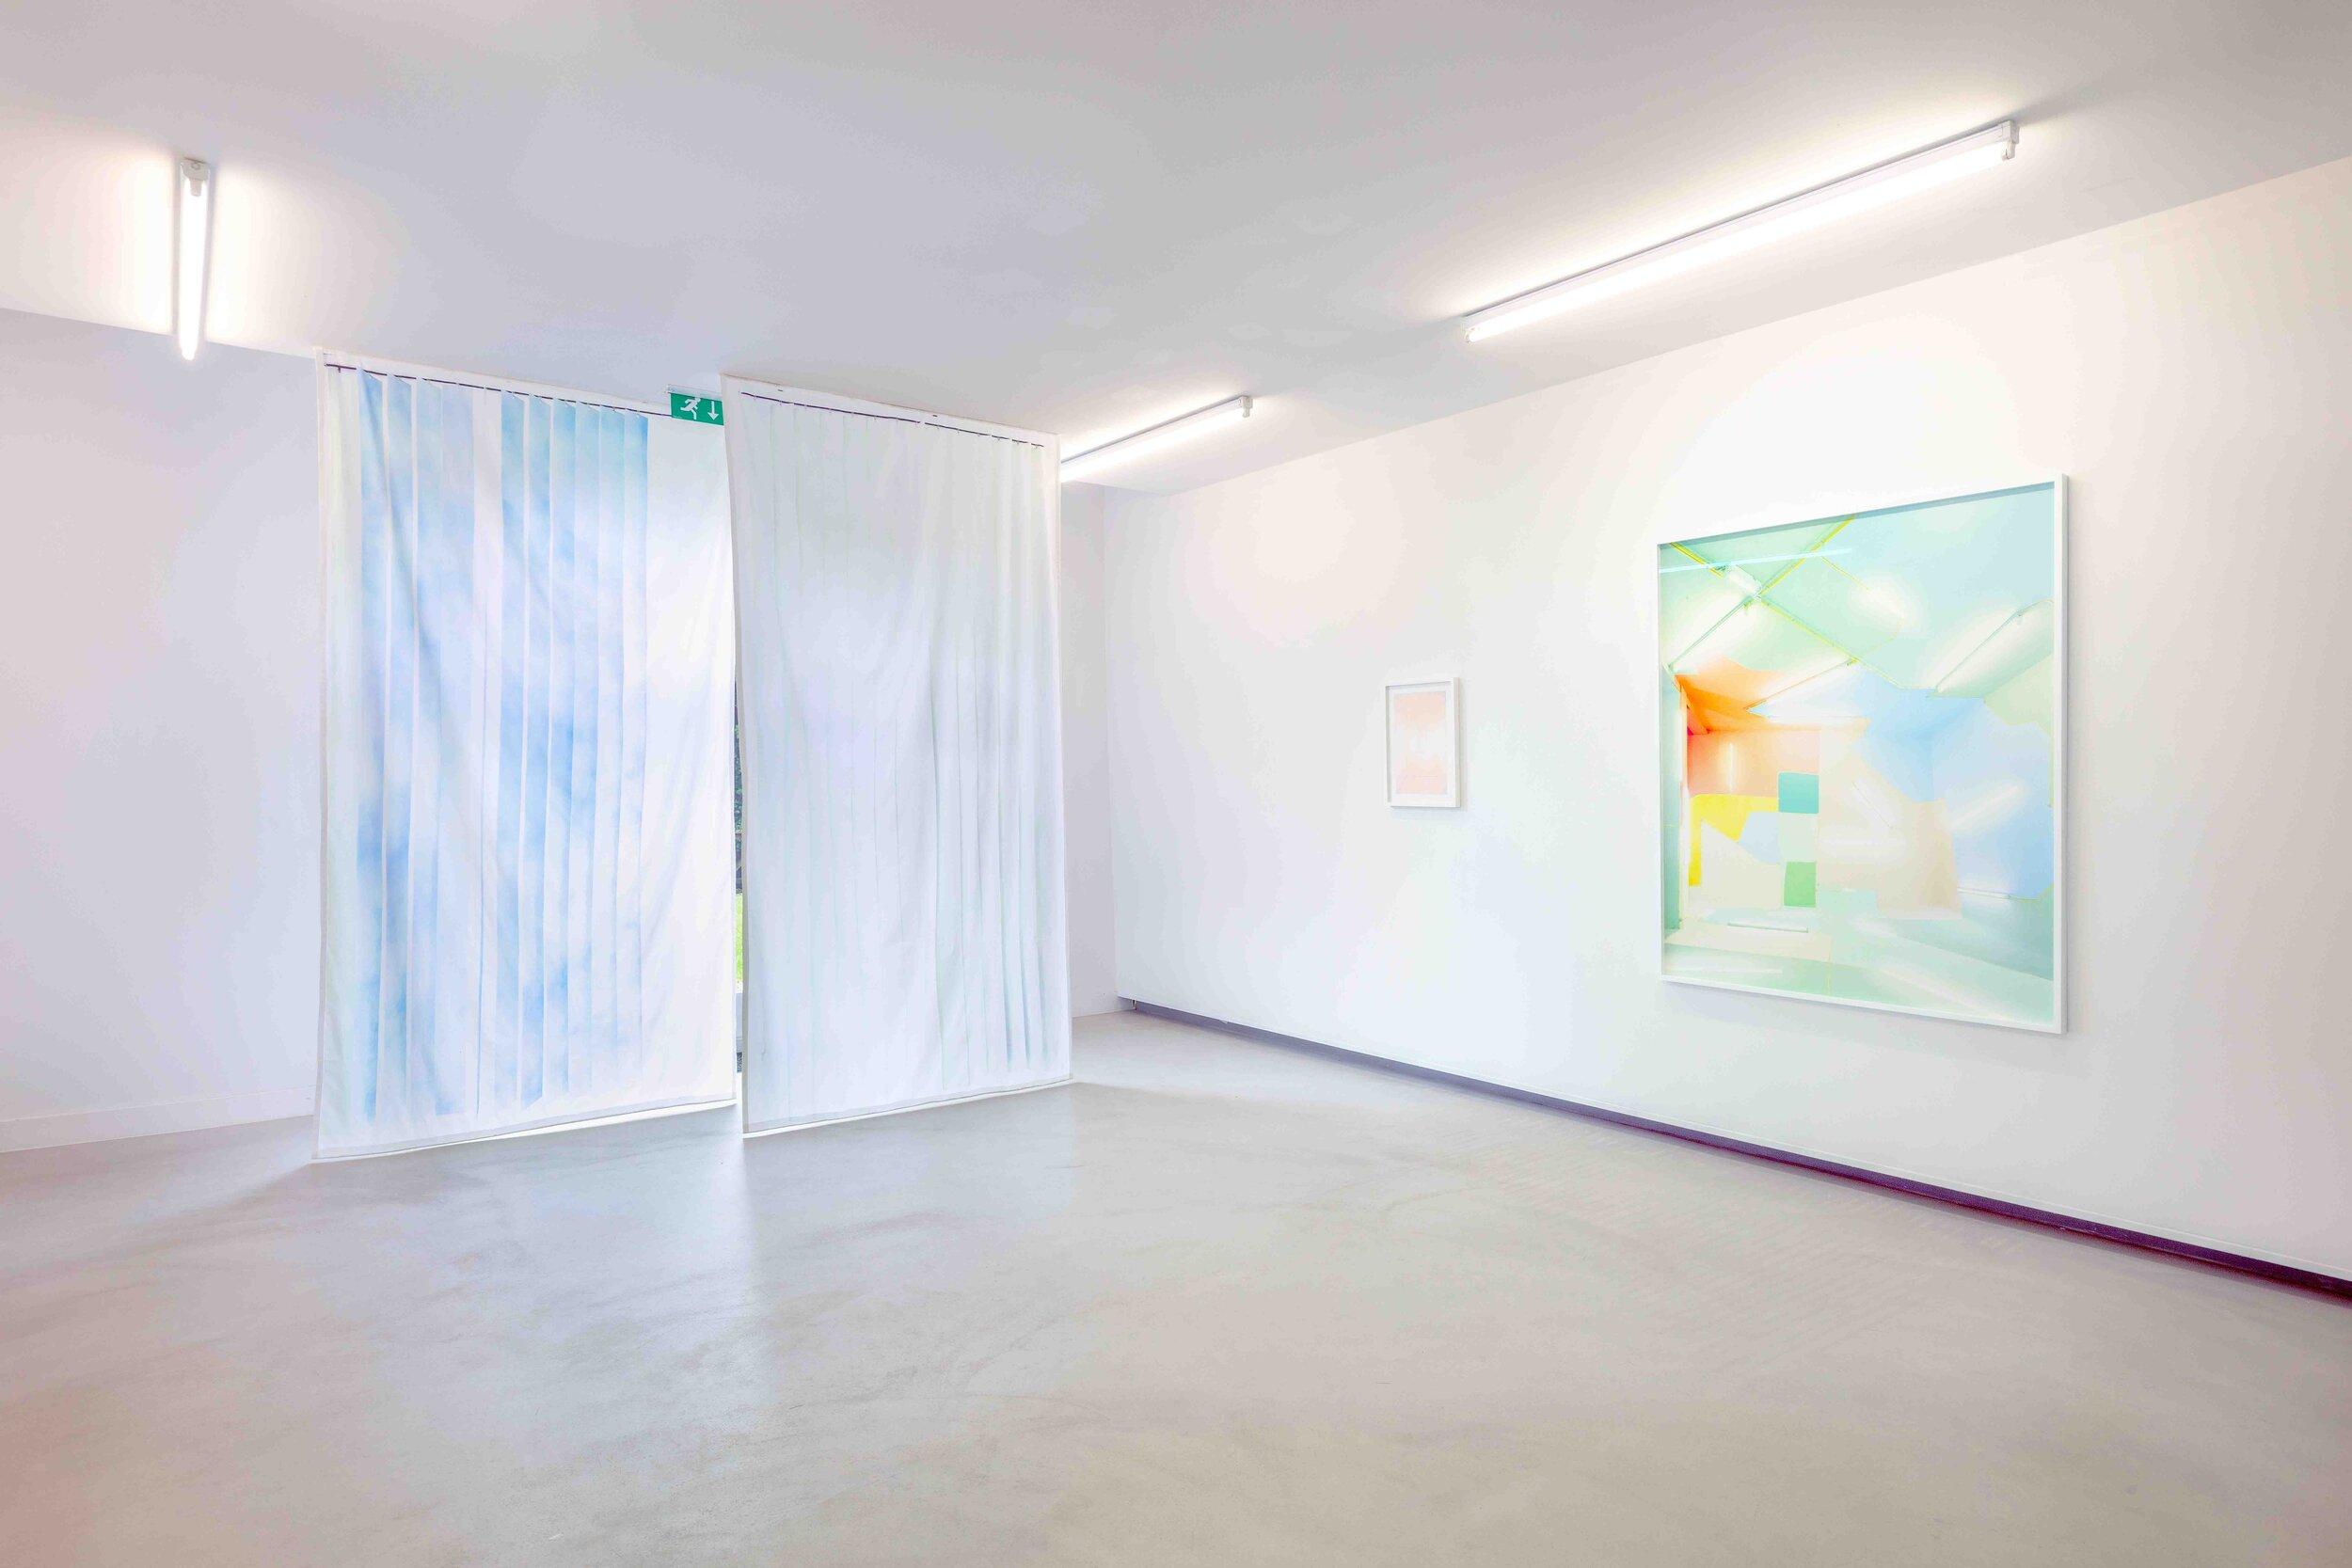 Sleeuwits-LayingBare-GalleryBart-1-usm.jpg